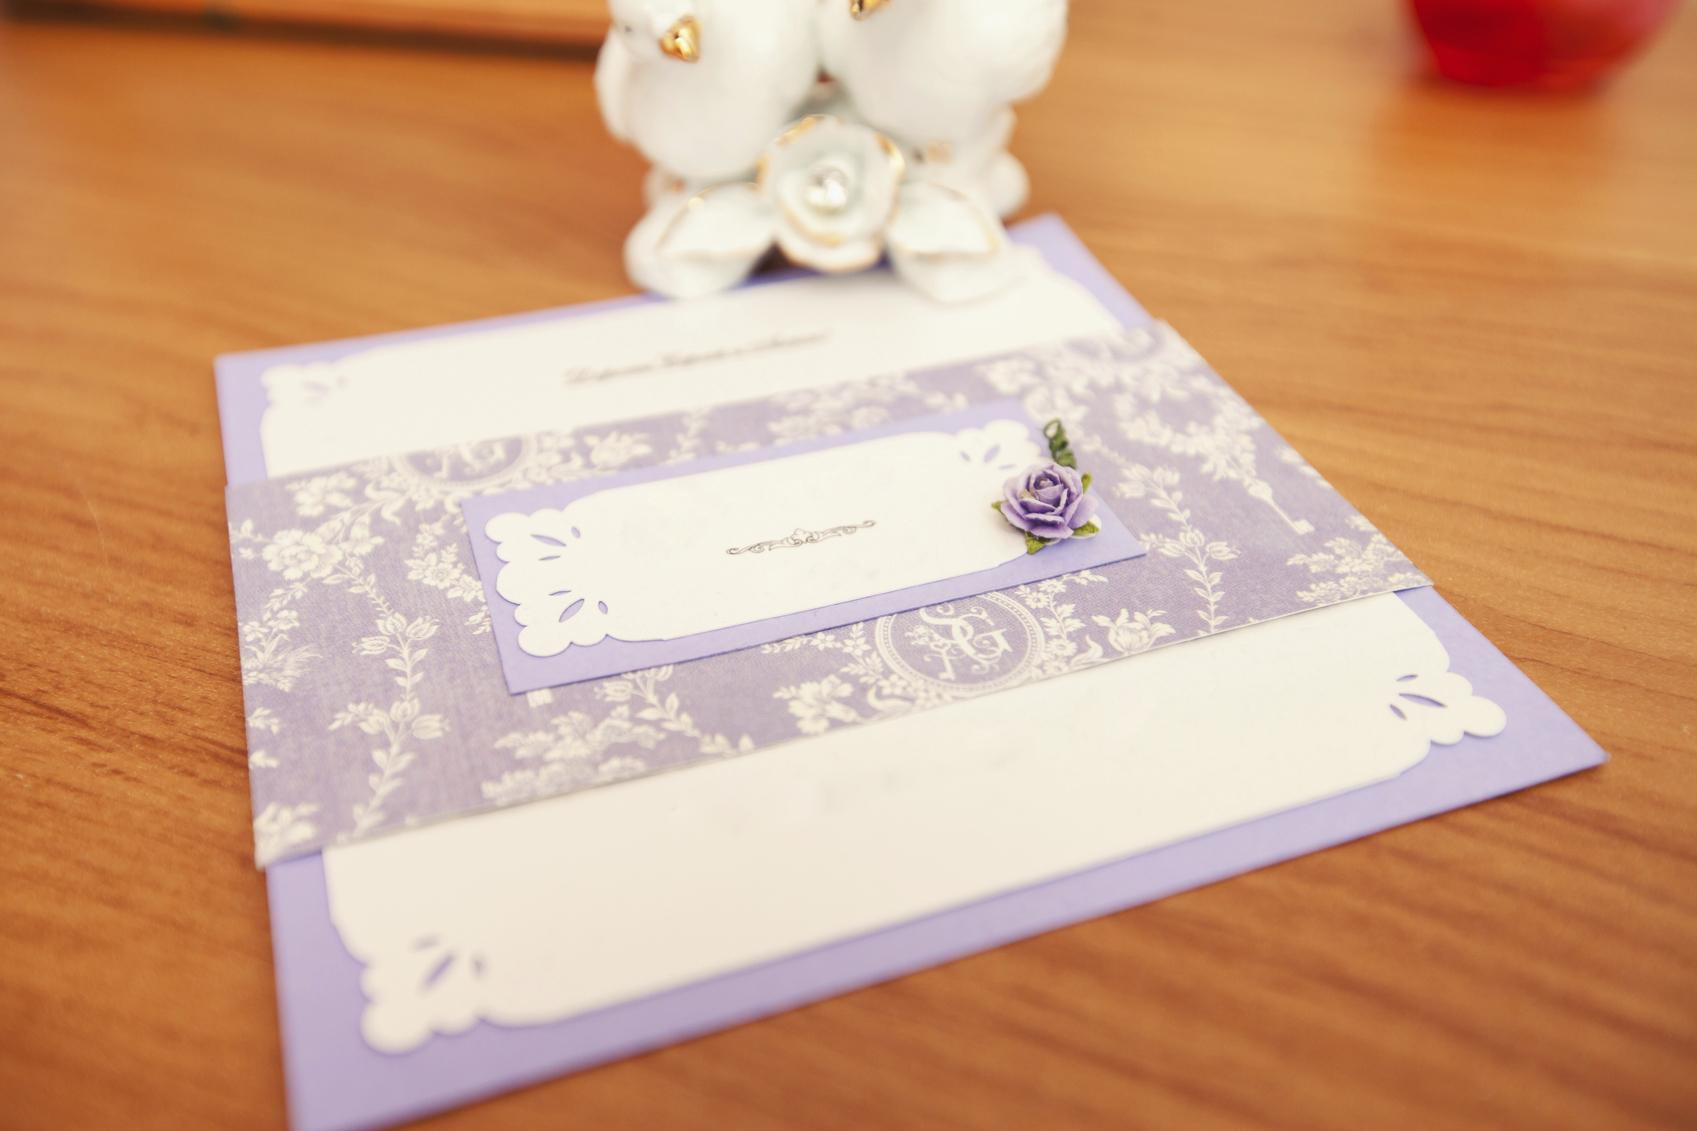 felicitaciones-tarjeta-de-boda.jpg